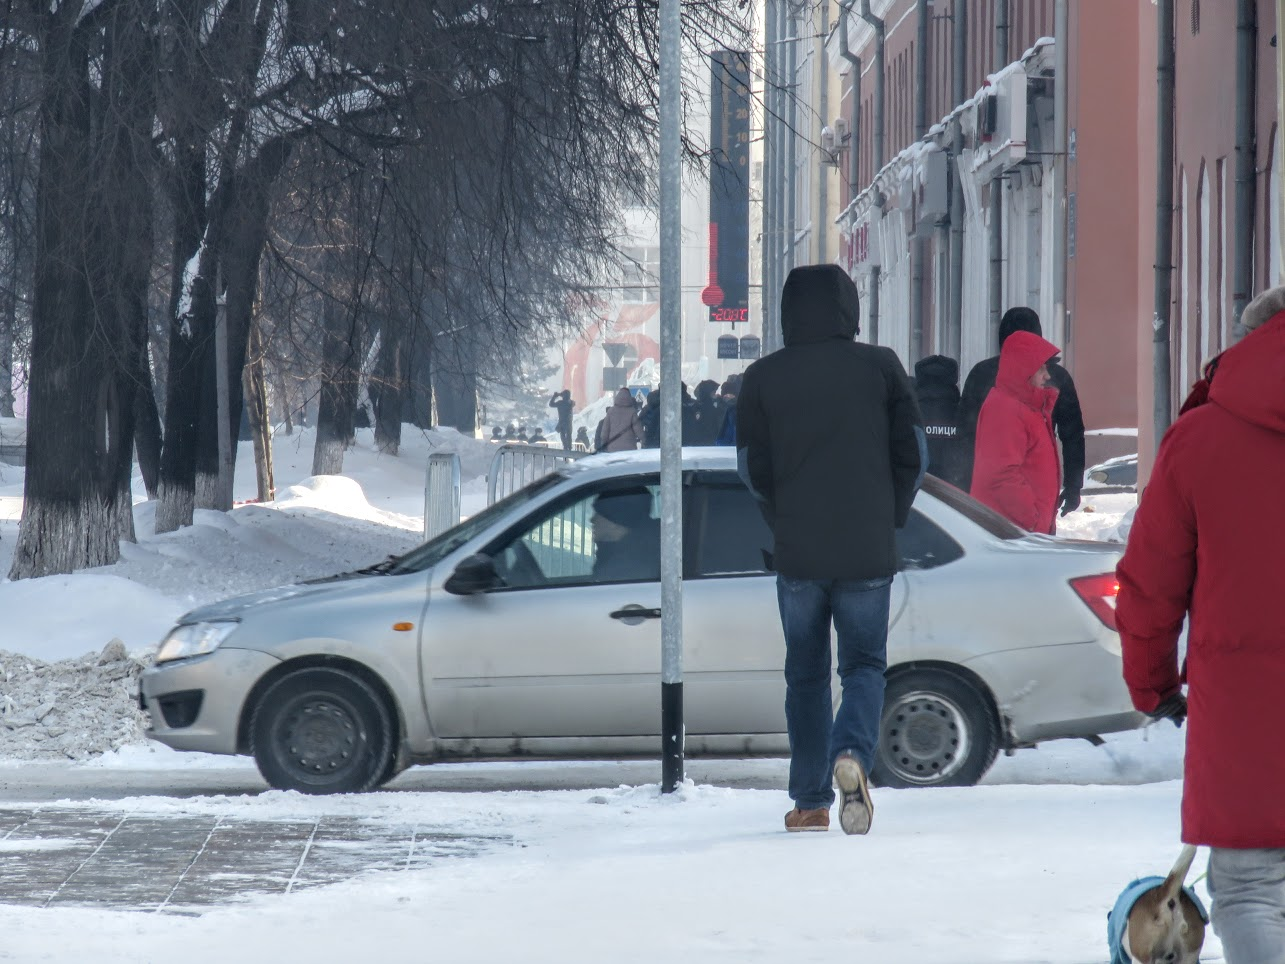 Транспорт не ходит - трамваи, троллейбусы. Полиция, люди, автозаки по городу IMG 1794